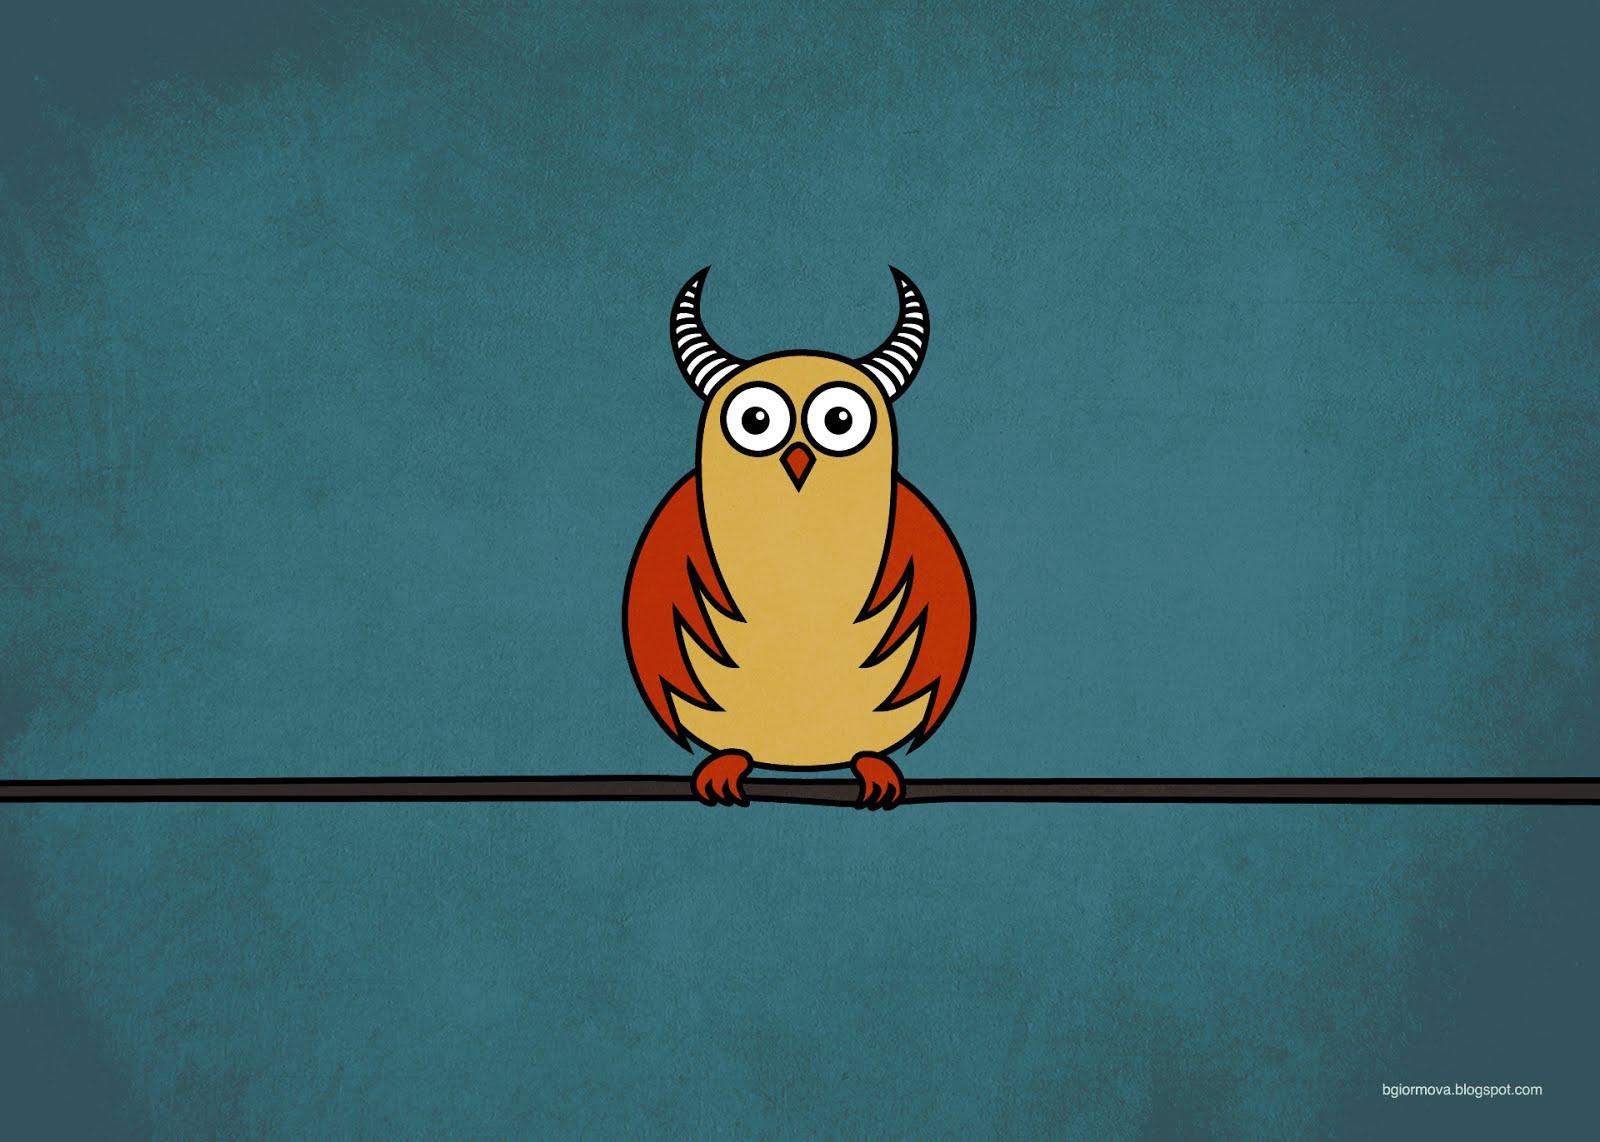 Get This Cartoon Owl Image As A Desktop Wallpaper And An IPhone